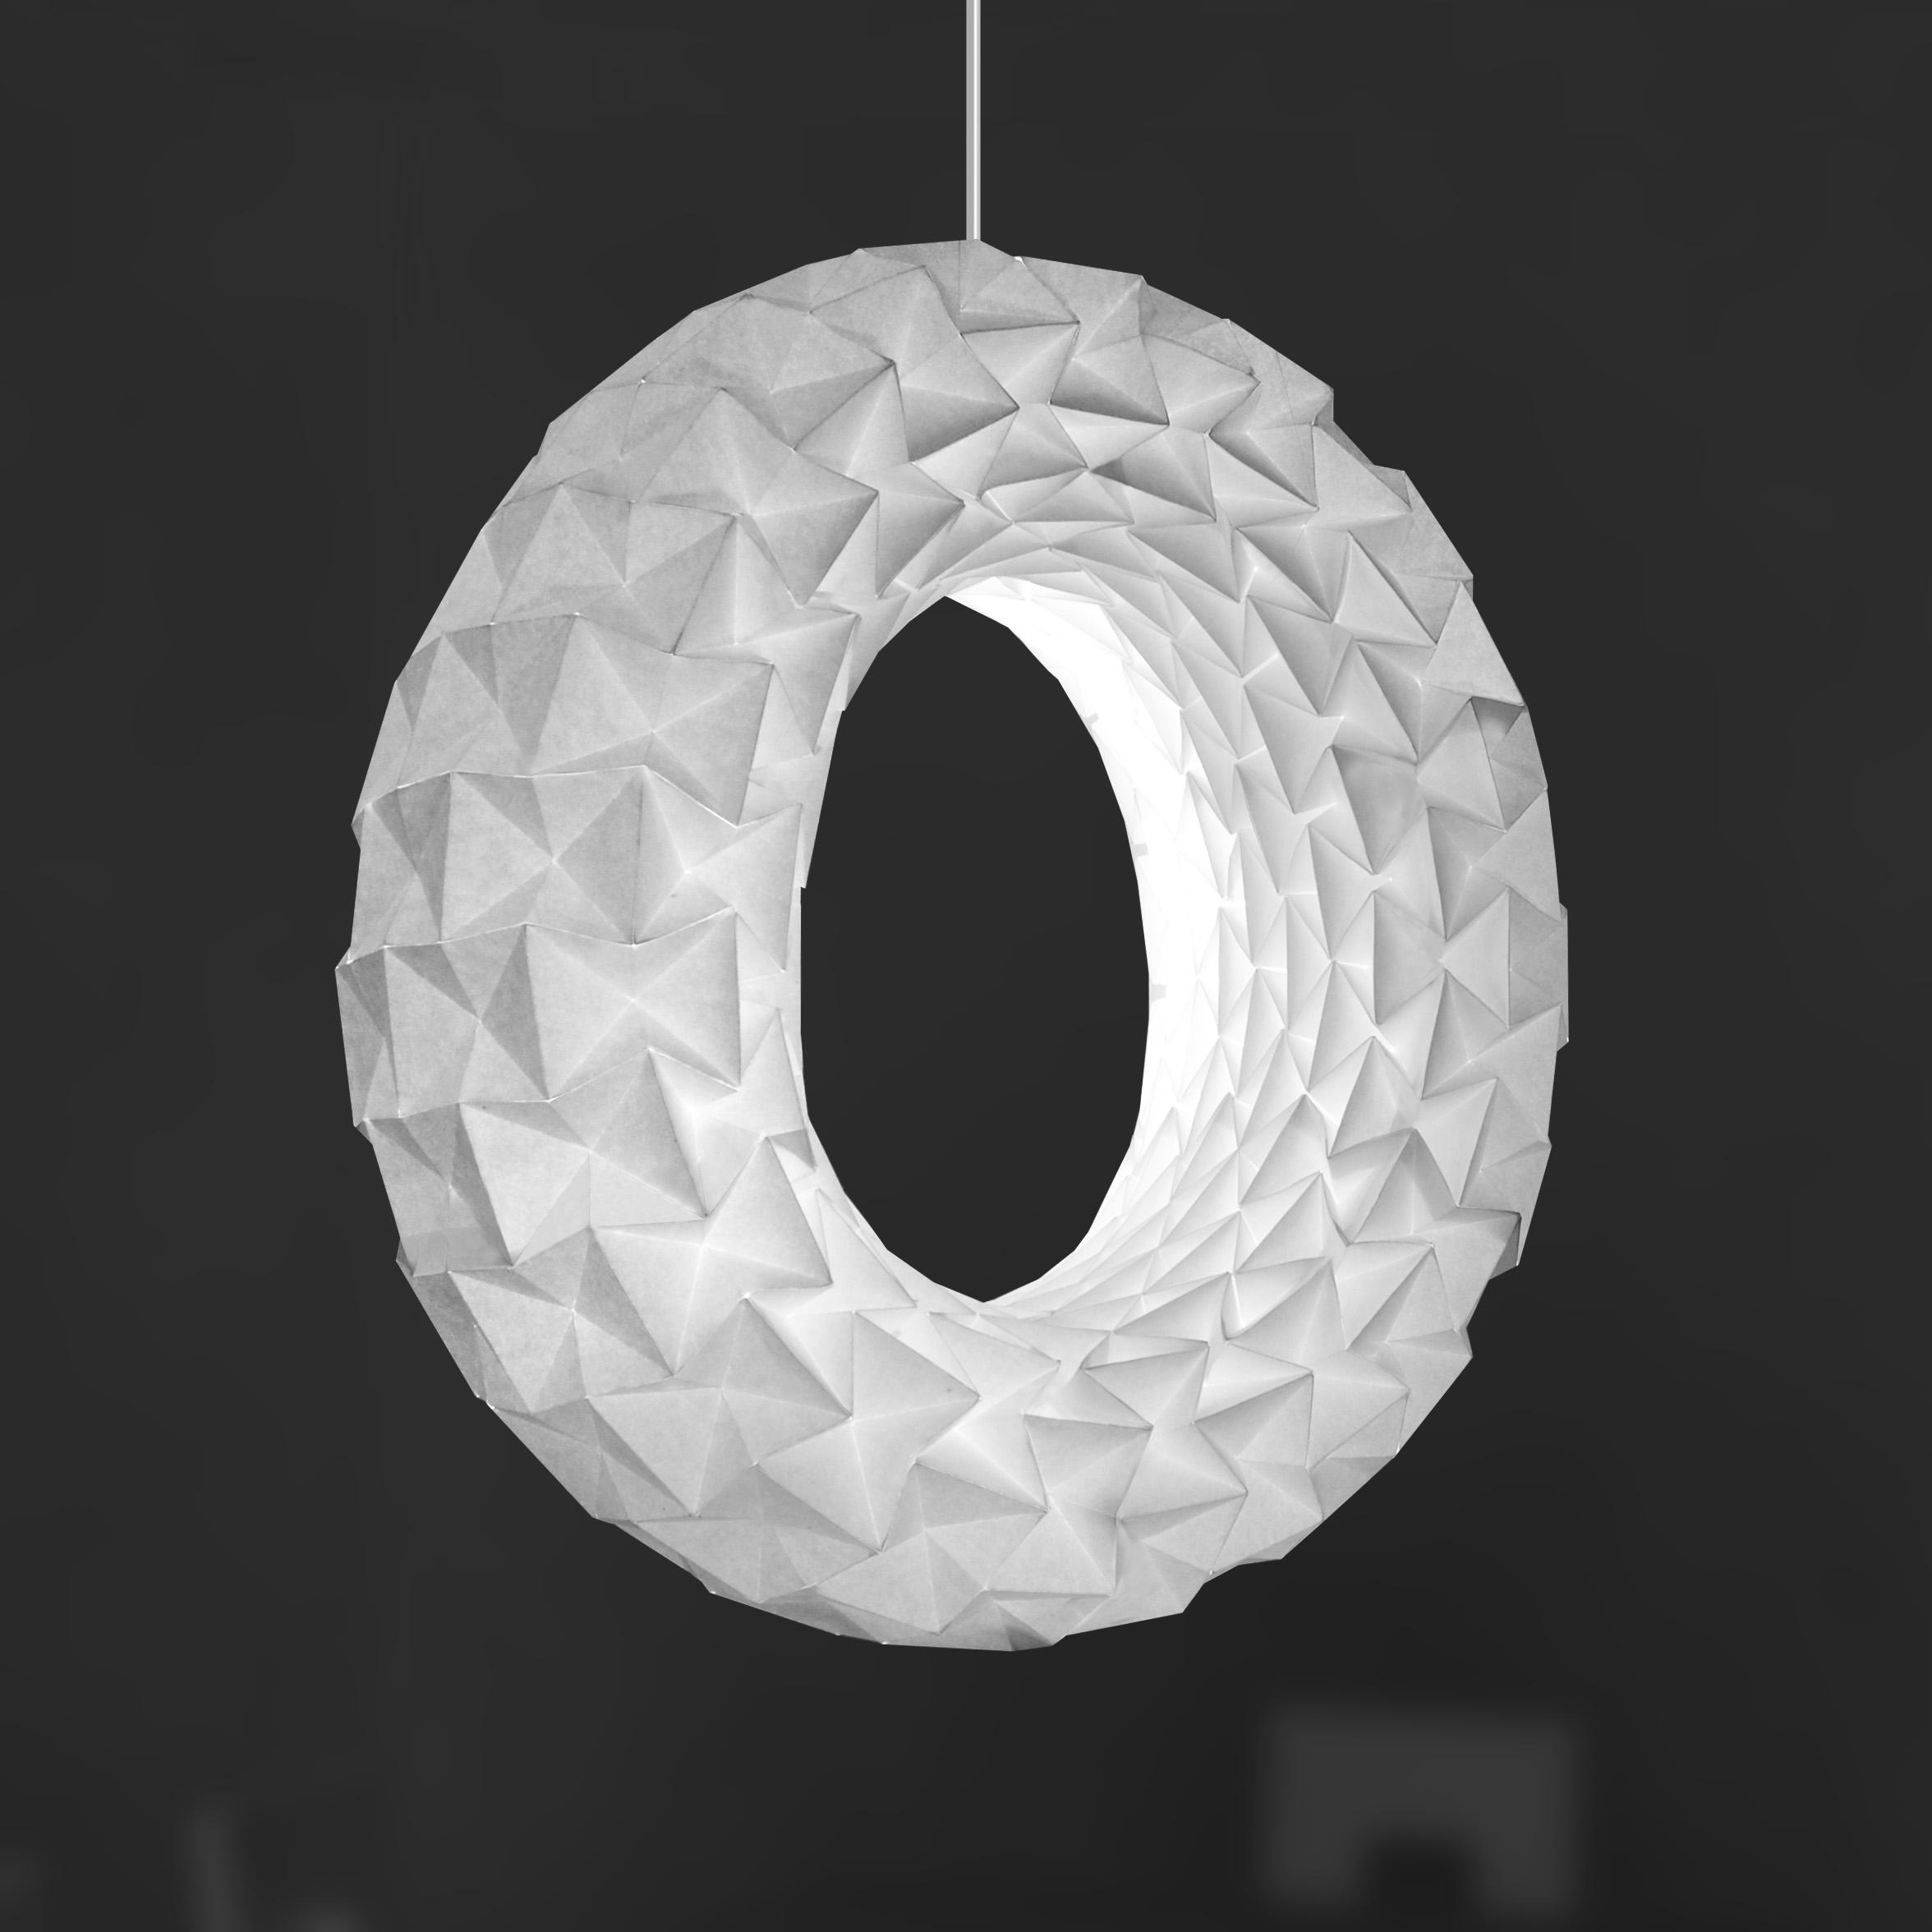 light_torus_night_1.jpg